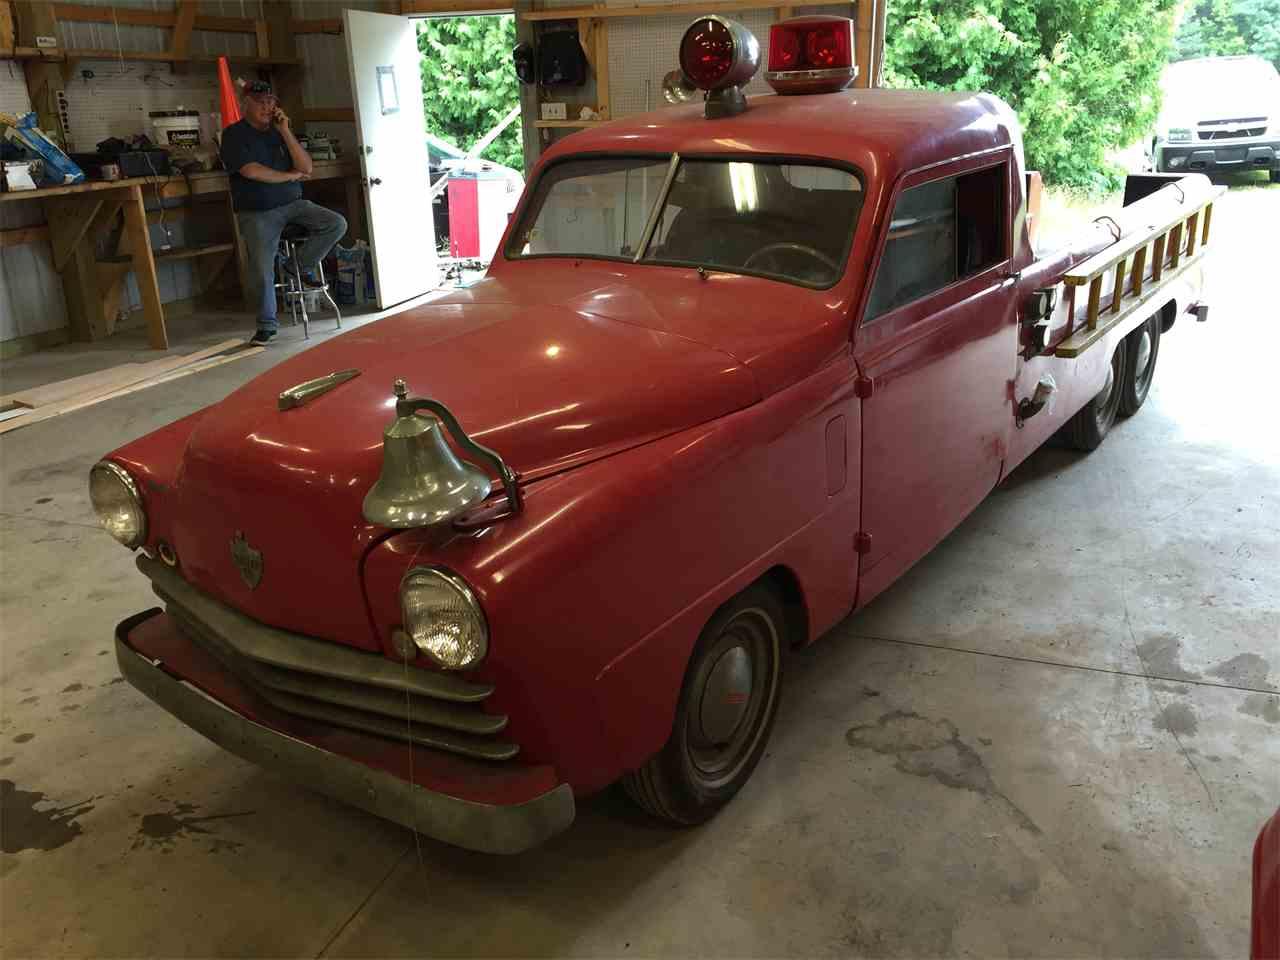 Used Cars Memphis Tn >> 1950 Crosley Fire Truck for Sale | ClassicCars.com | CC ...